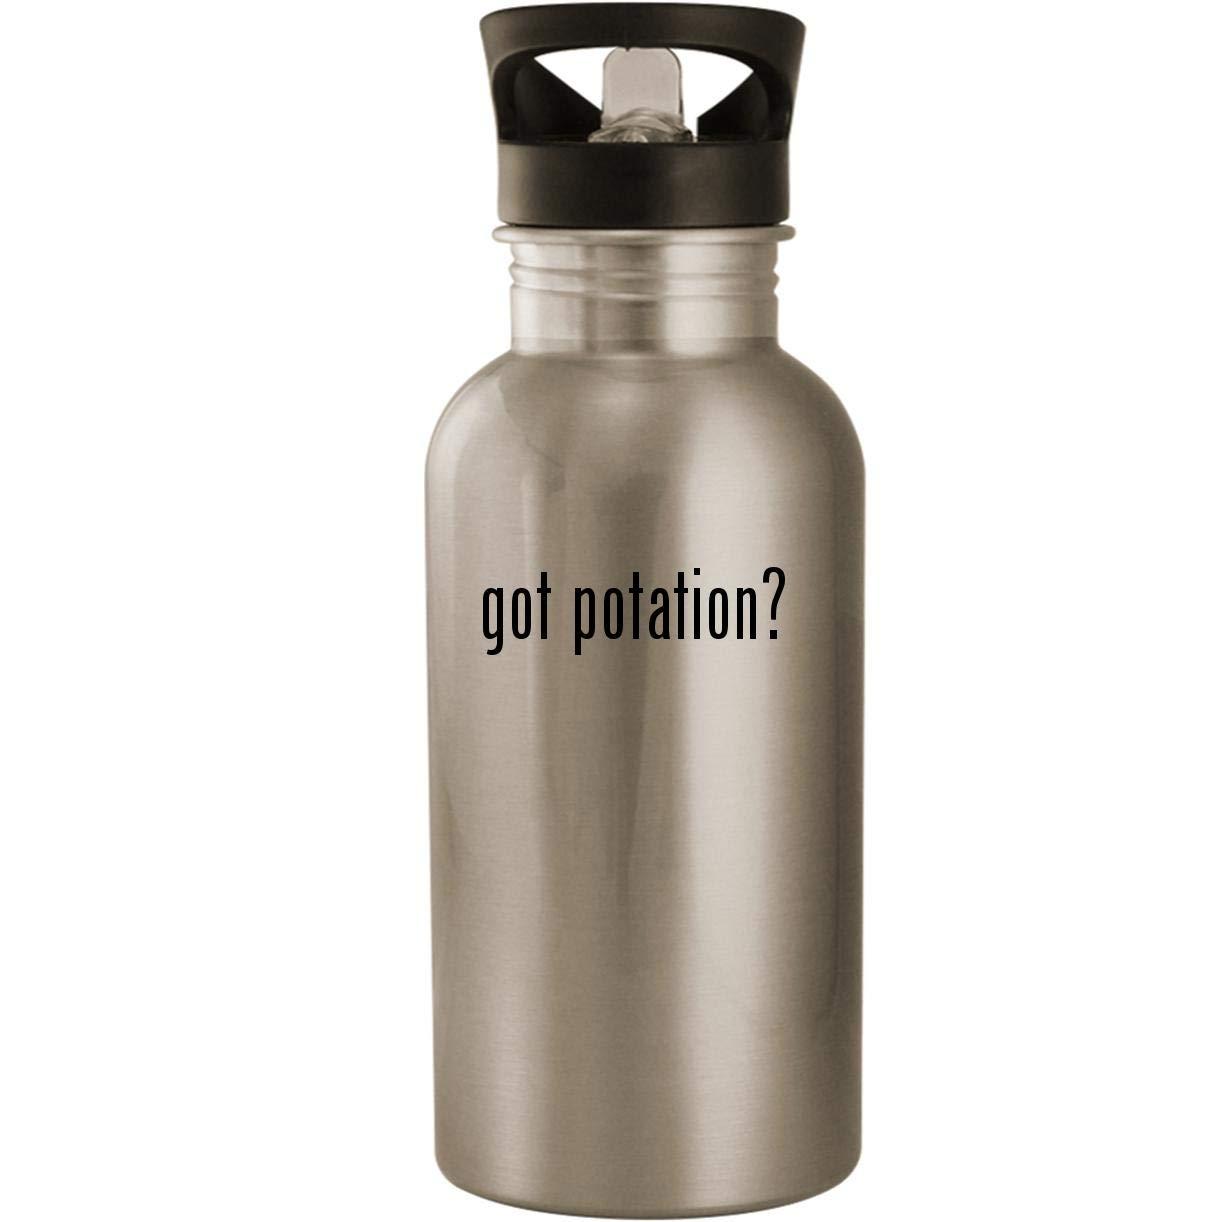 got potation? - Stainless Steel 20oz Road Ready Water Bottle, Silver